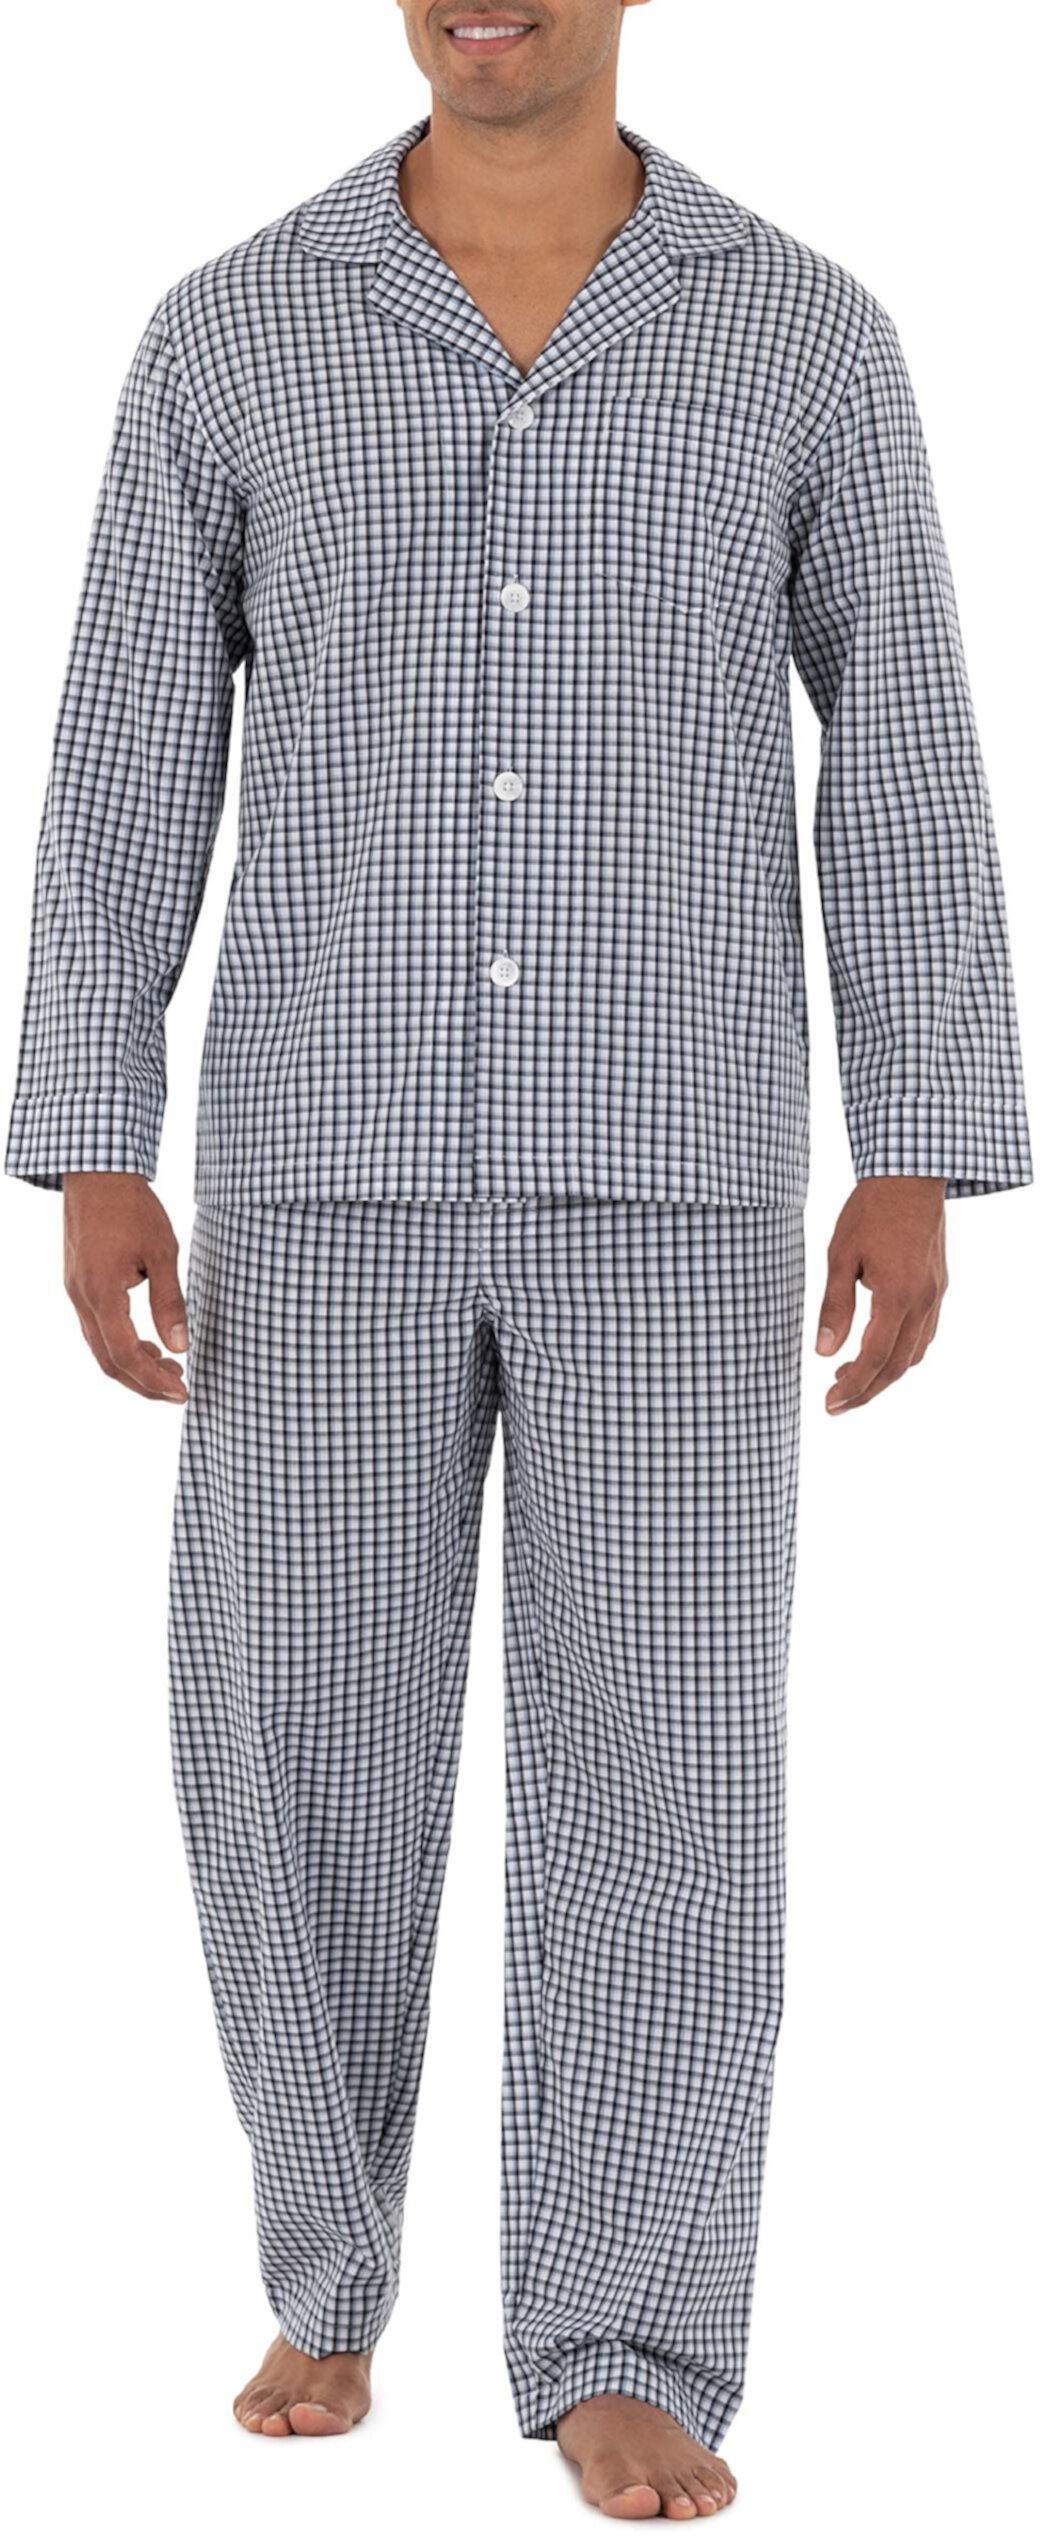 Long Sleeve Broadcloth Pajama Set Fruit of The Loom